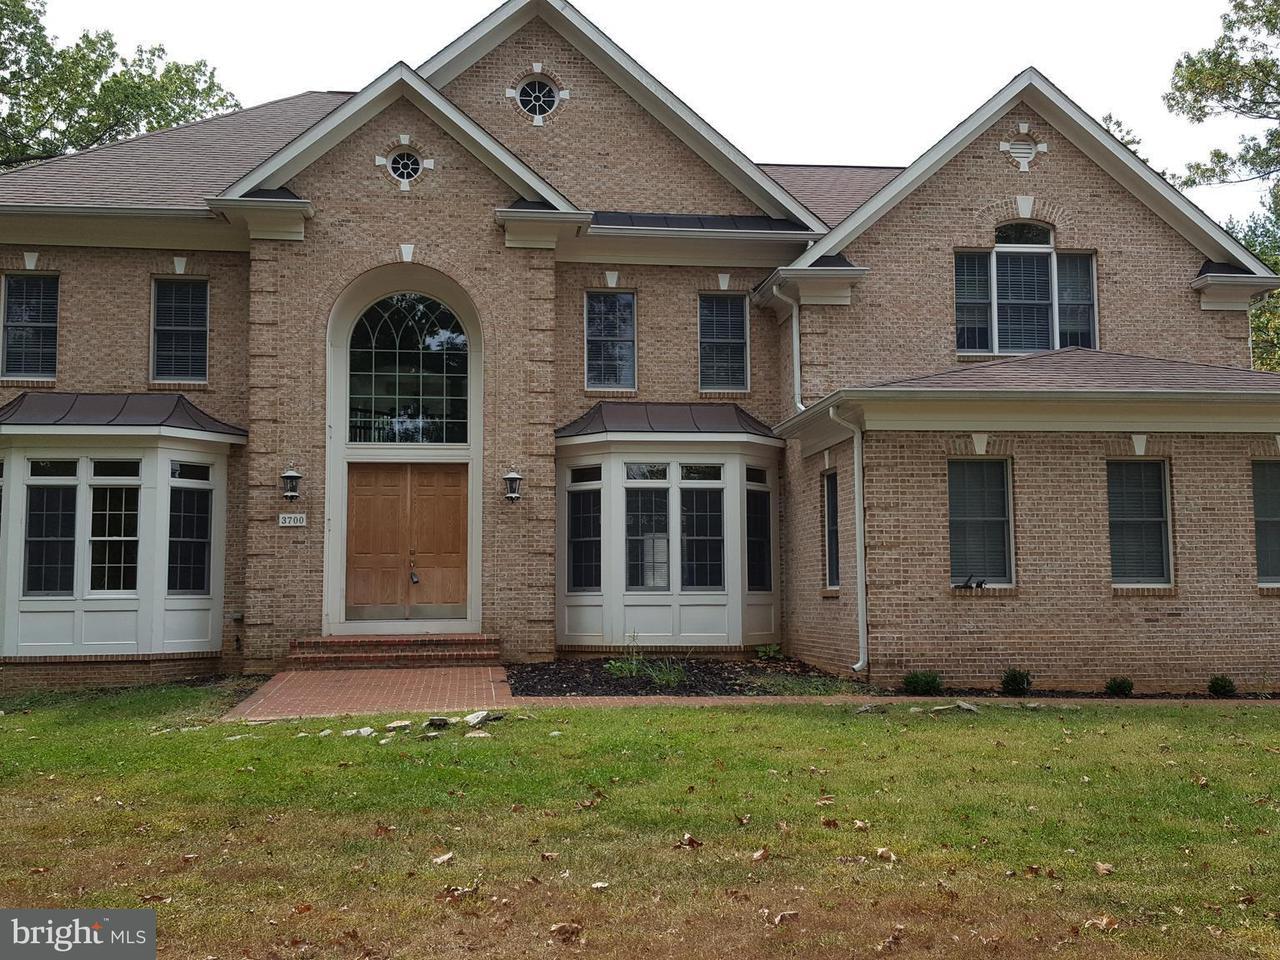 Частный односемейный дом для того Продажа на 3700 ANNANDALE Road 3700 ANNANDALE Road Annandale, Виргиния 22003 Соединенные Штаты